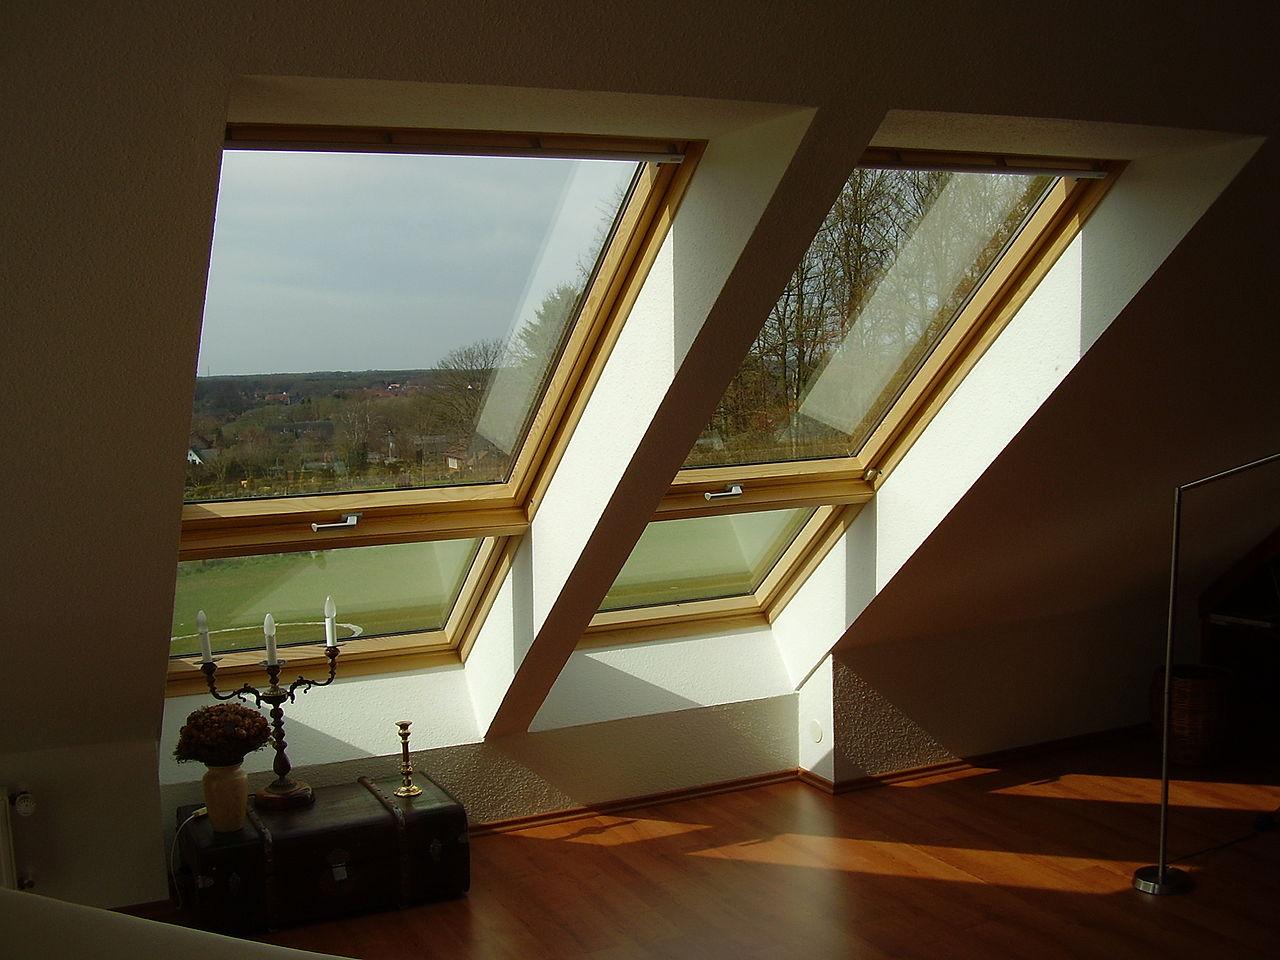 datei dachfenster 7 jpg wikipedia. Black Bedroom Furniture Sets. Home Design Ideas